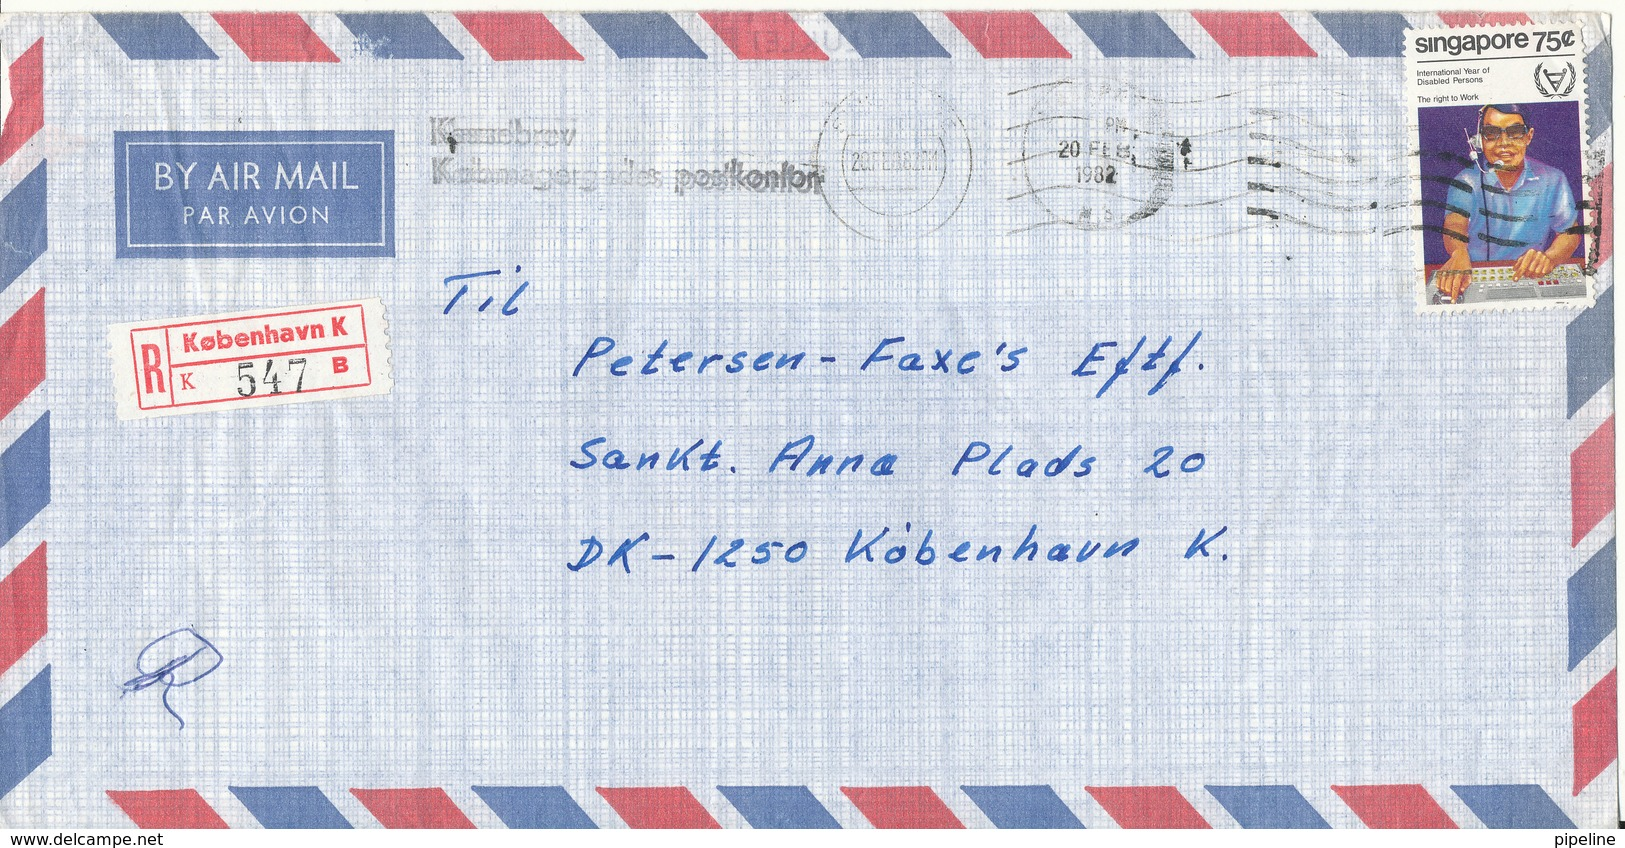 Singapore Registered Air Mail Cover Sent To Denmark From M/T Ulfsborg Dannebrog Rederi 20-2-1982 - Singapore (1959-...)